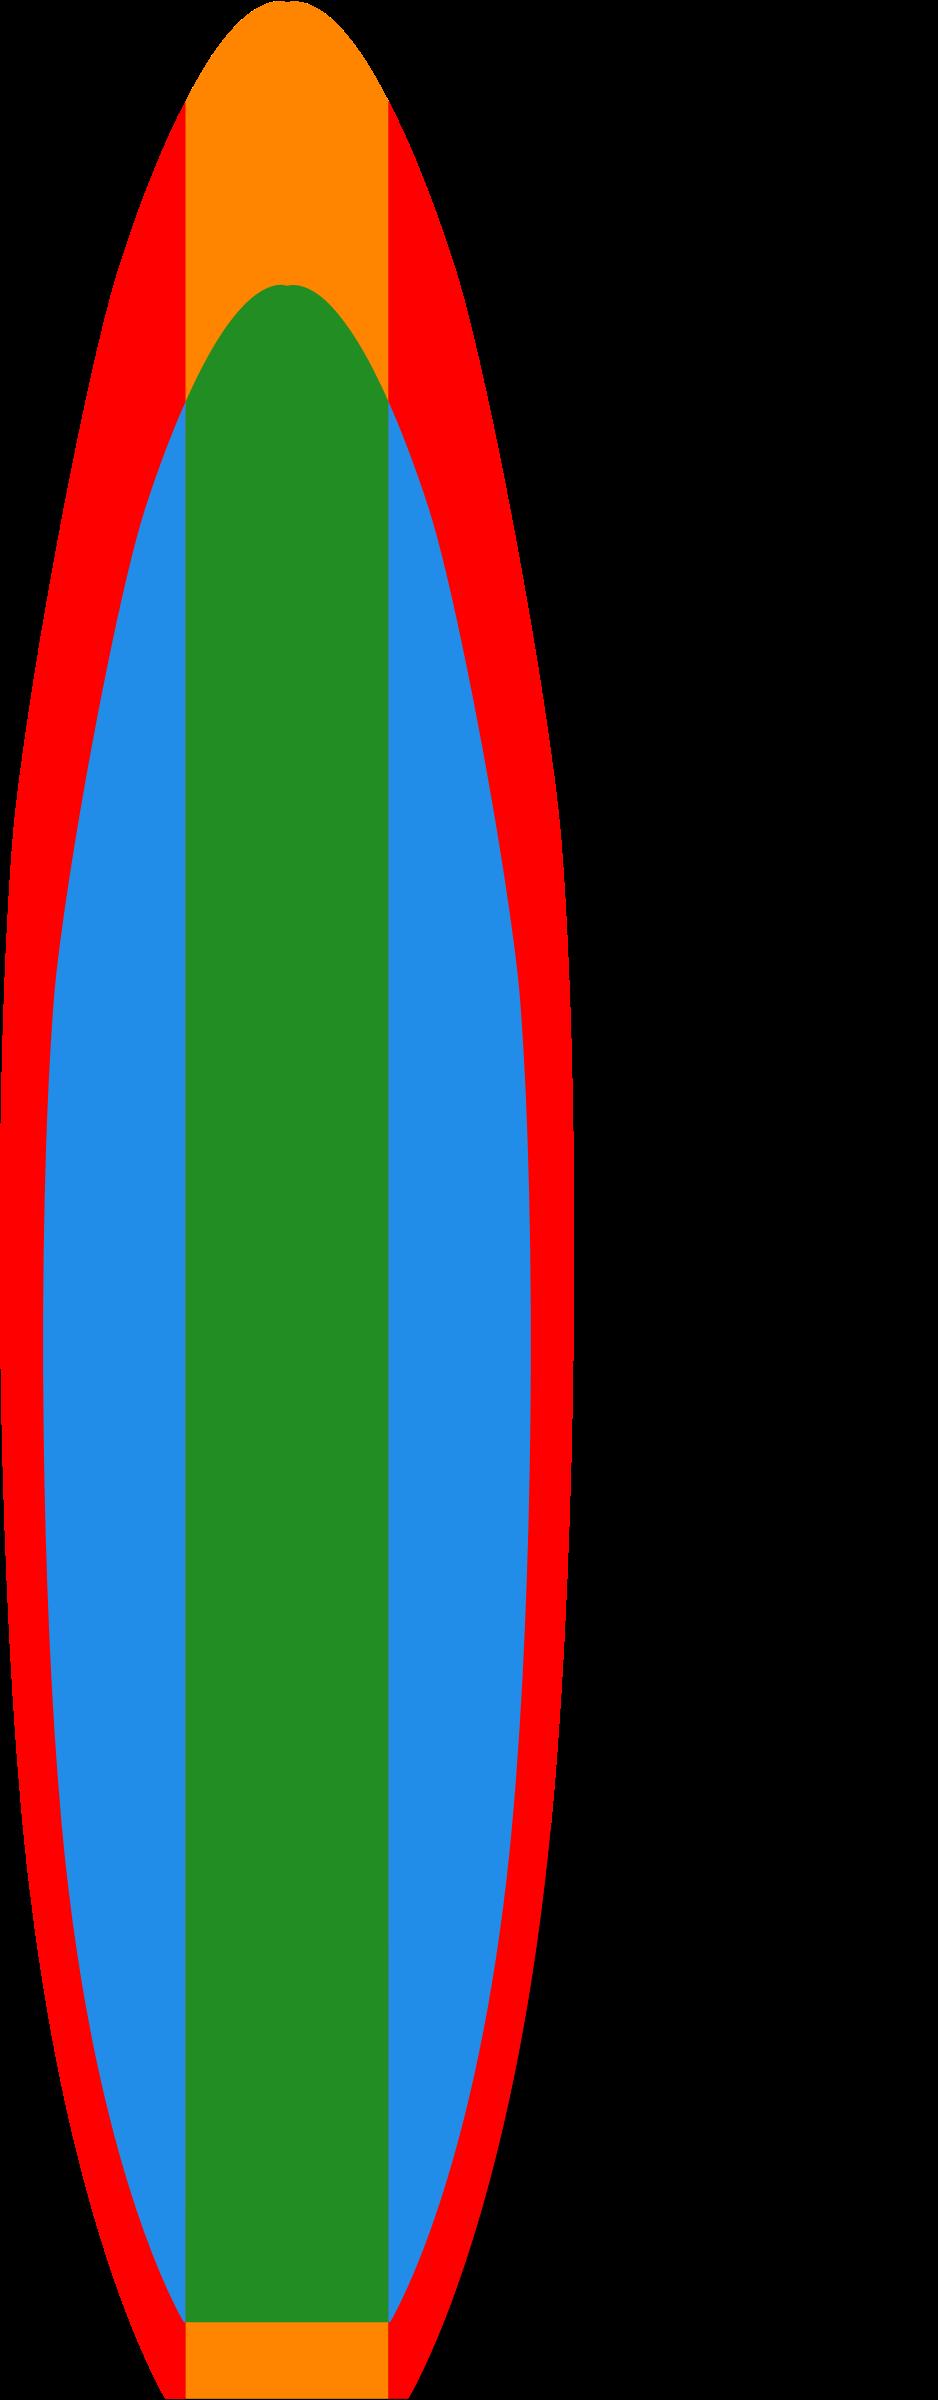 Clipart wave surfboard. Clip art free panda